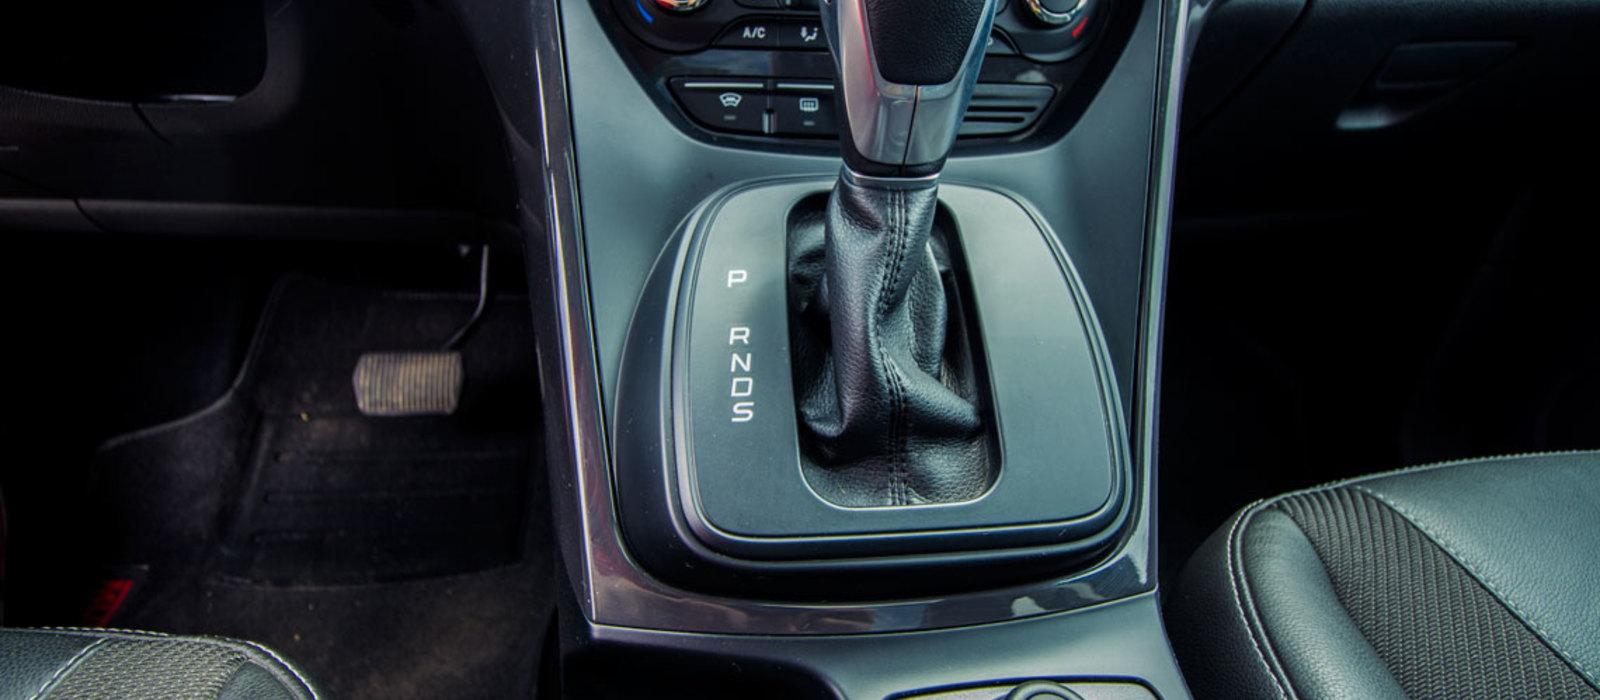 ikinci el araba 2014 Ford Kuga 1.6 EcoBoost Titanium Benzin Otomatik 14000 KM 5